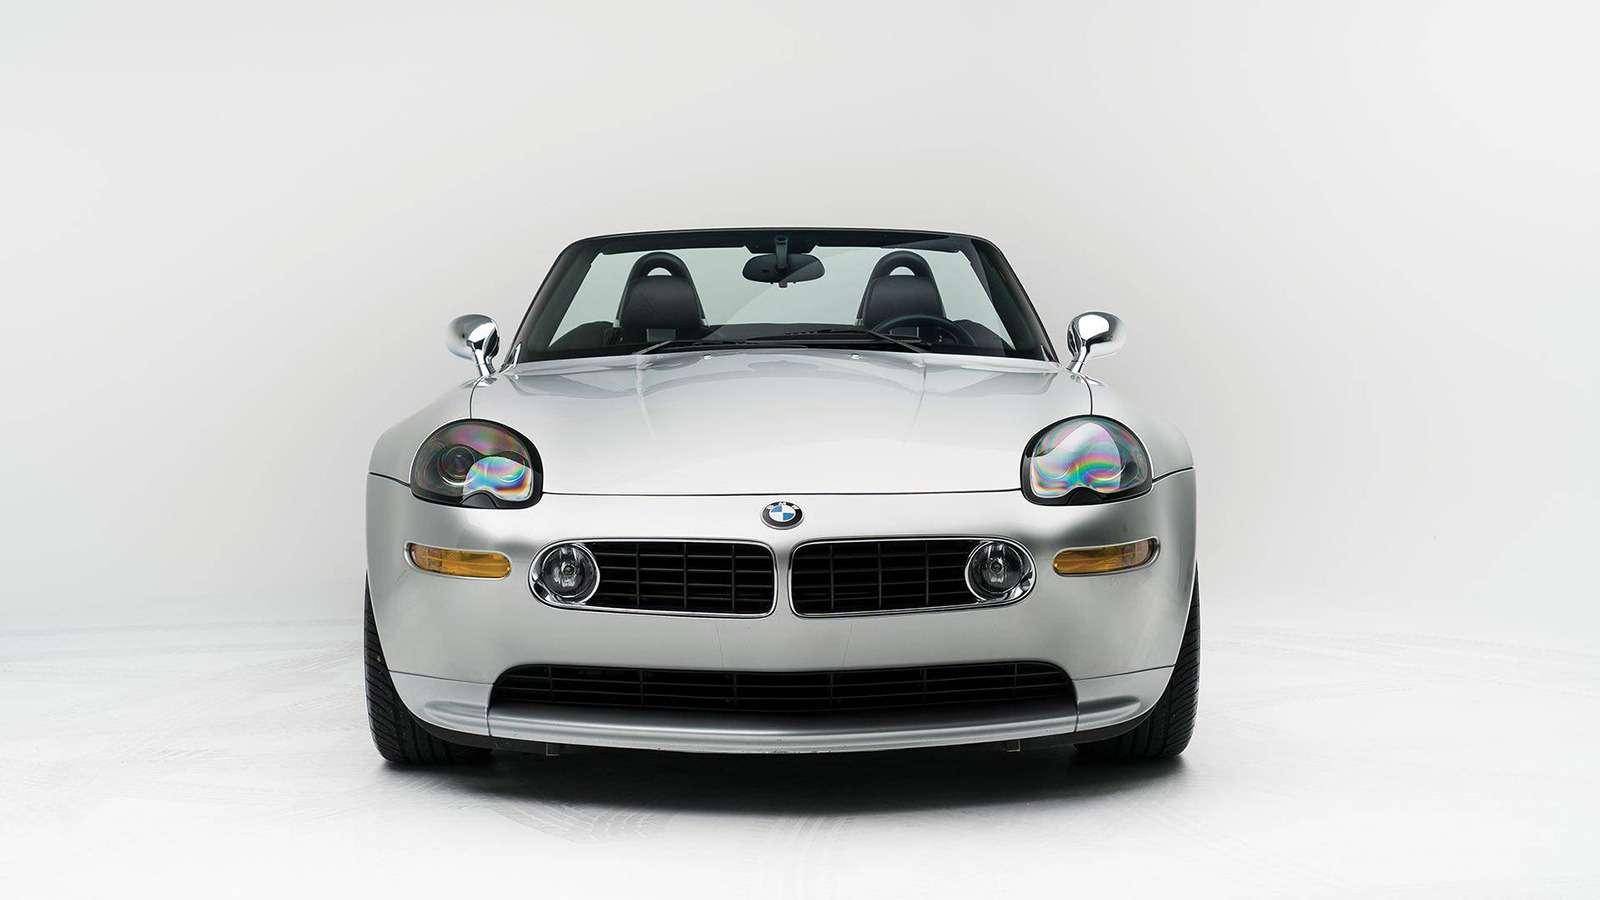 Автомобиль Стива Джобса продадут саукциона. Вместе стелефоном (ноэто не iPhone)— фото 811154